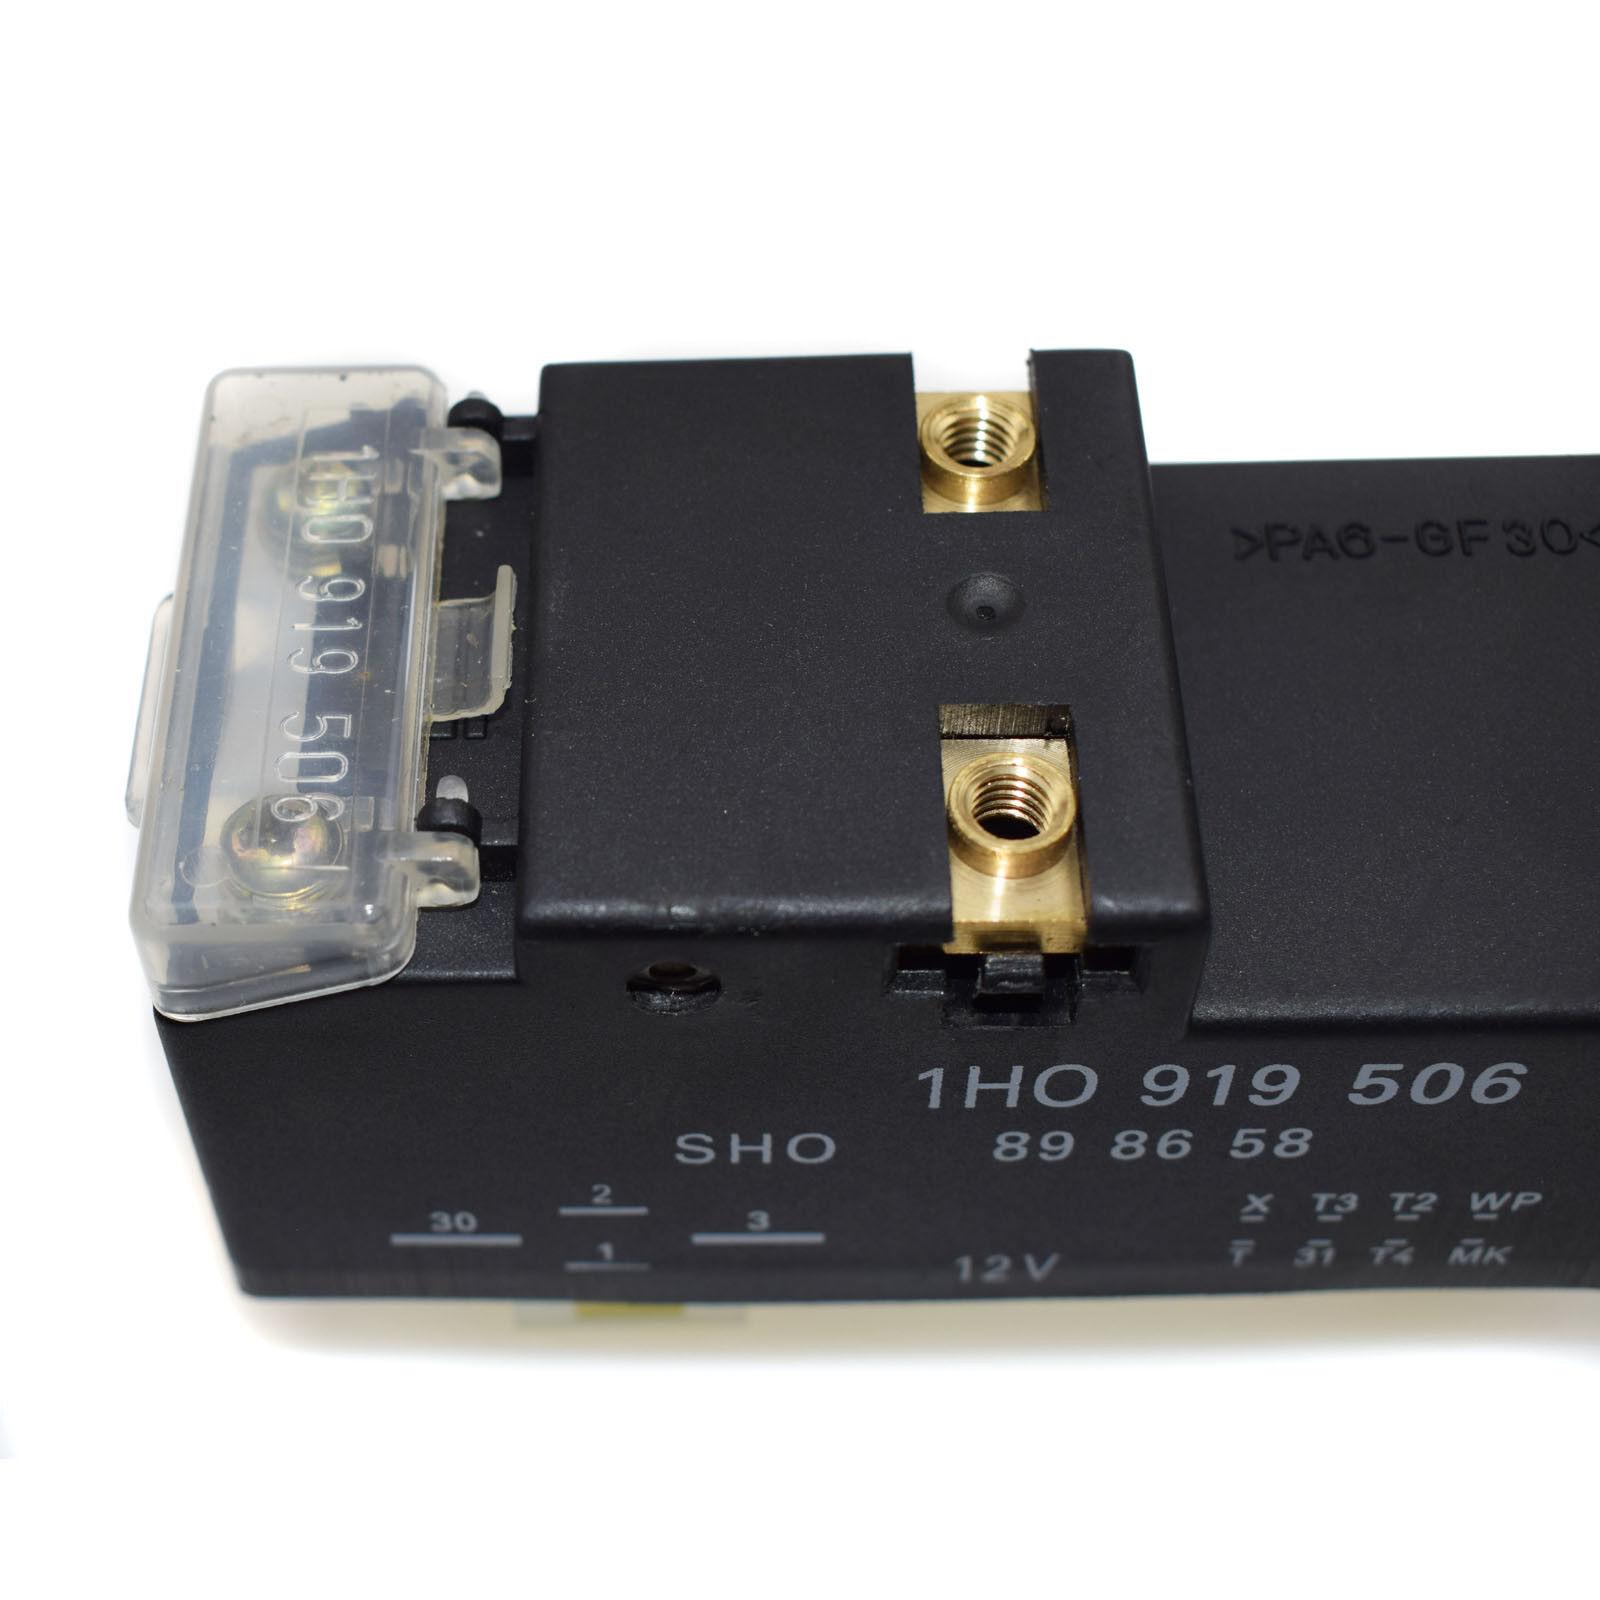 hight resolution of buy cooling fan switch relay radiator for 92 93 94 vw golf jetta corrado 1h0919506 online ebay